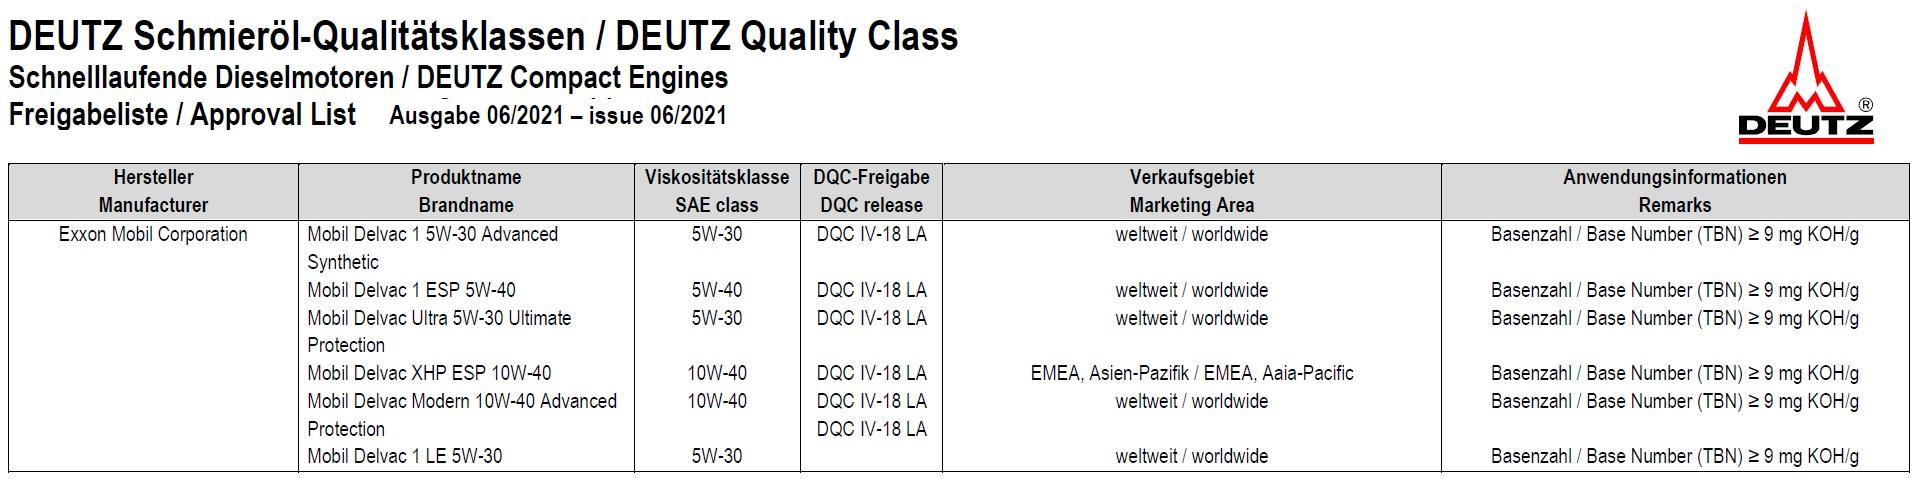 Deutz Quality Class Deutz DQC IV-18 LA